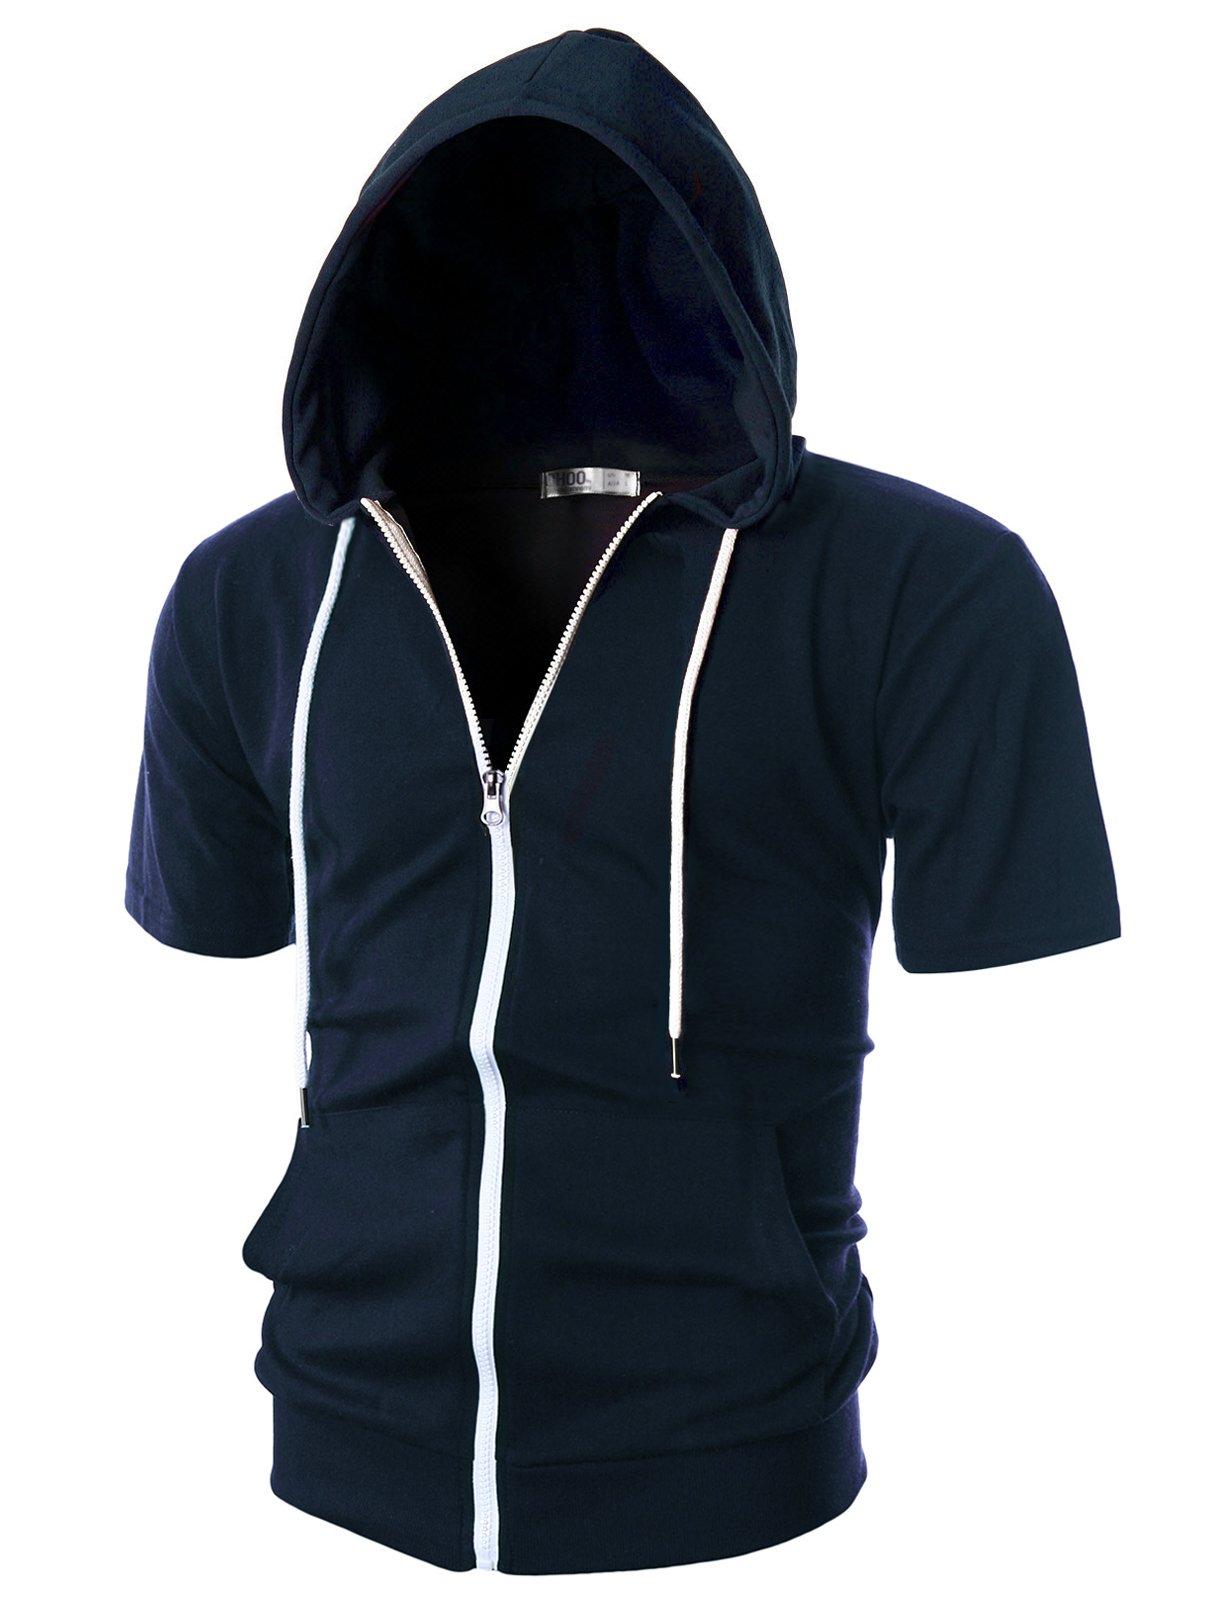 Ohoo Mens Slim Fit Short Sleeve Lightweight Zip-up Hoodie with Kanga Pocket/DCF007-NAVY-XL